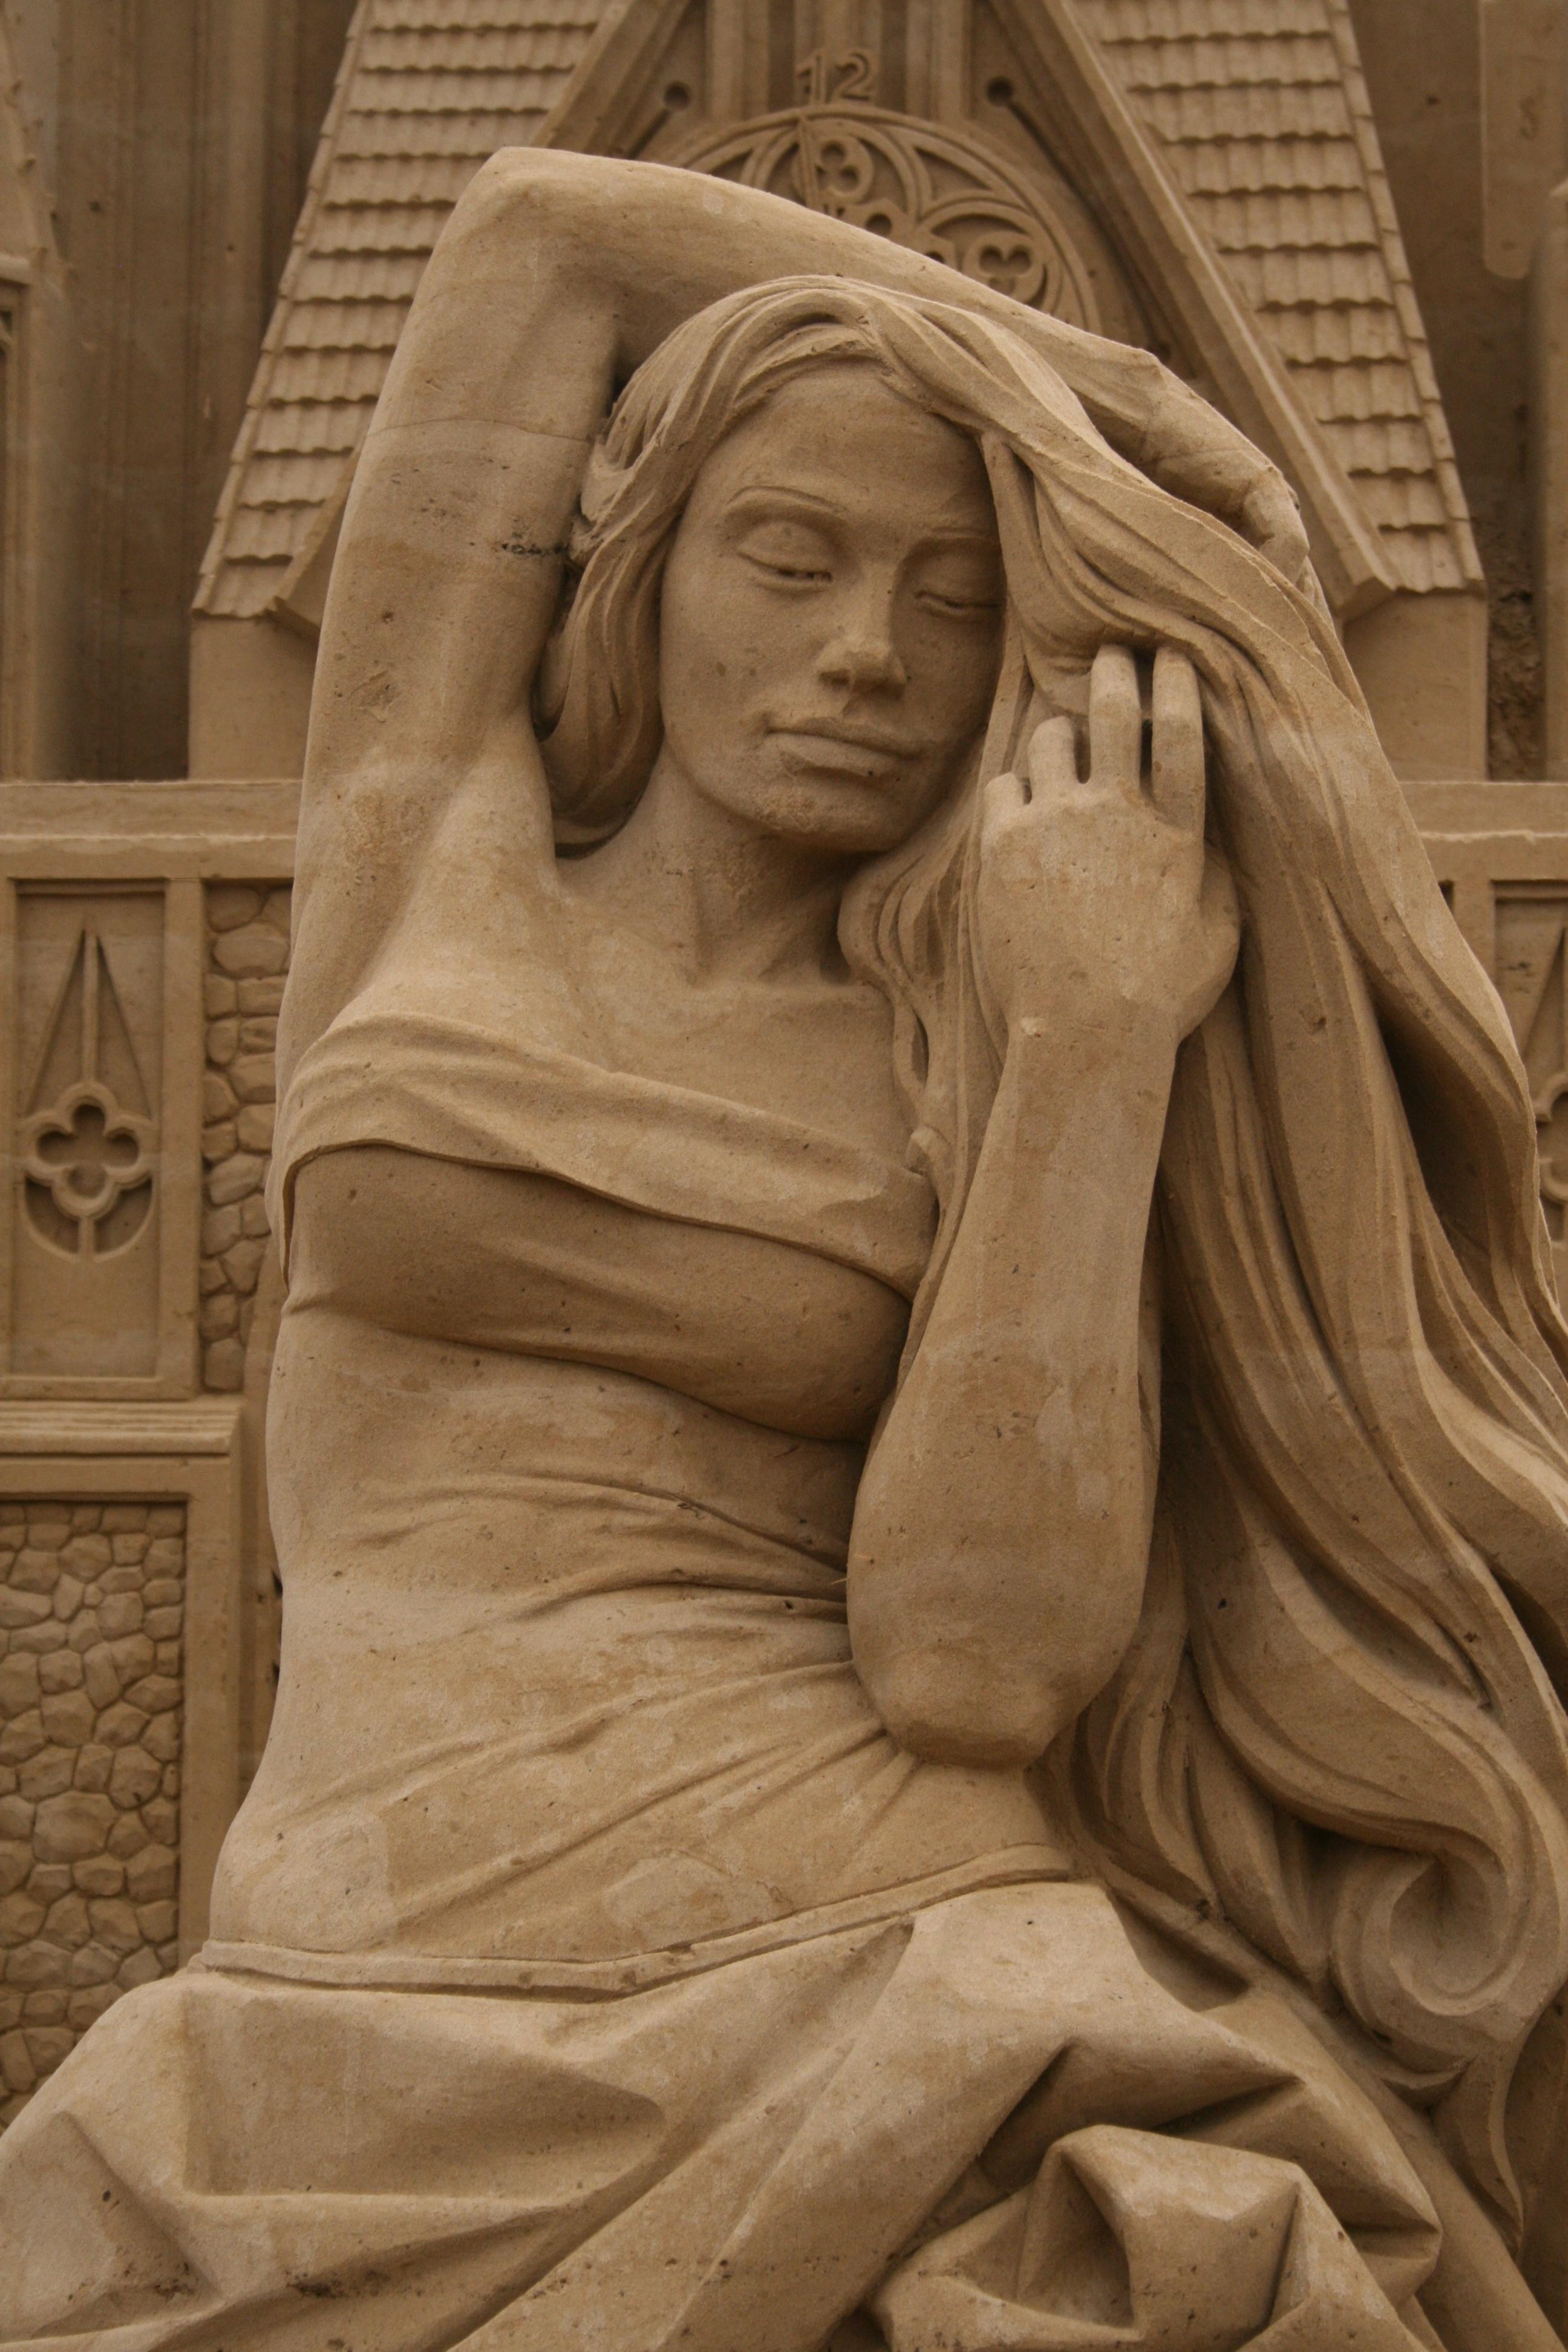 The dress color original image of statue